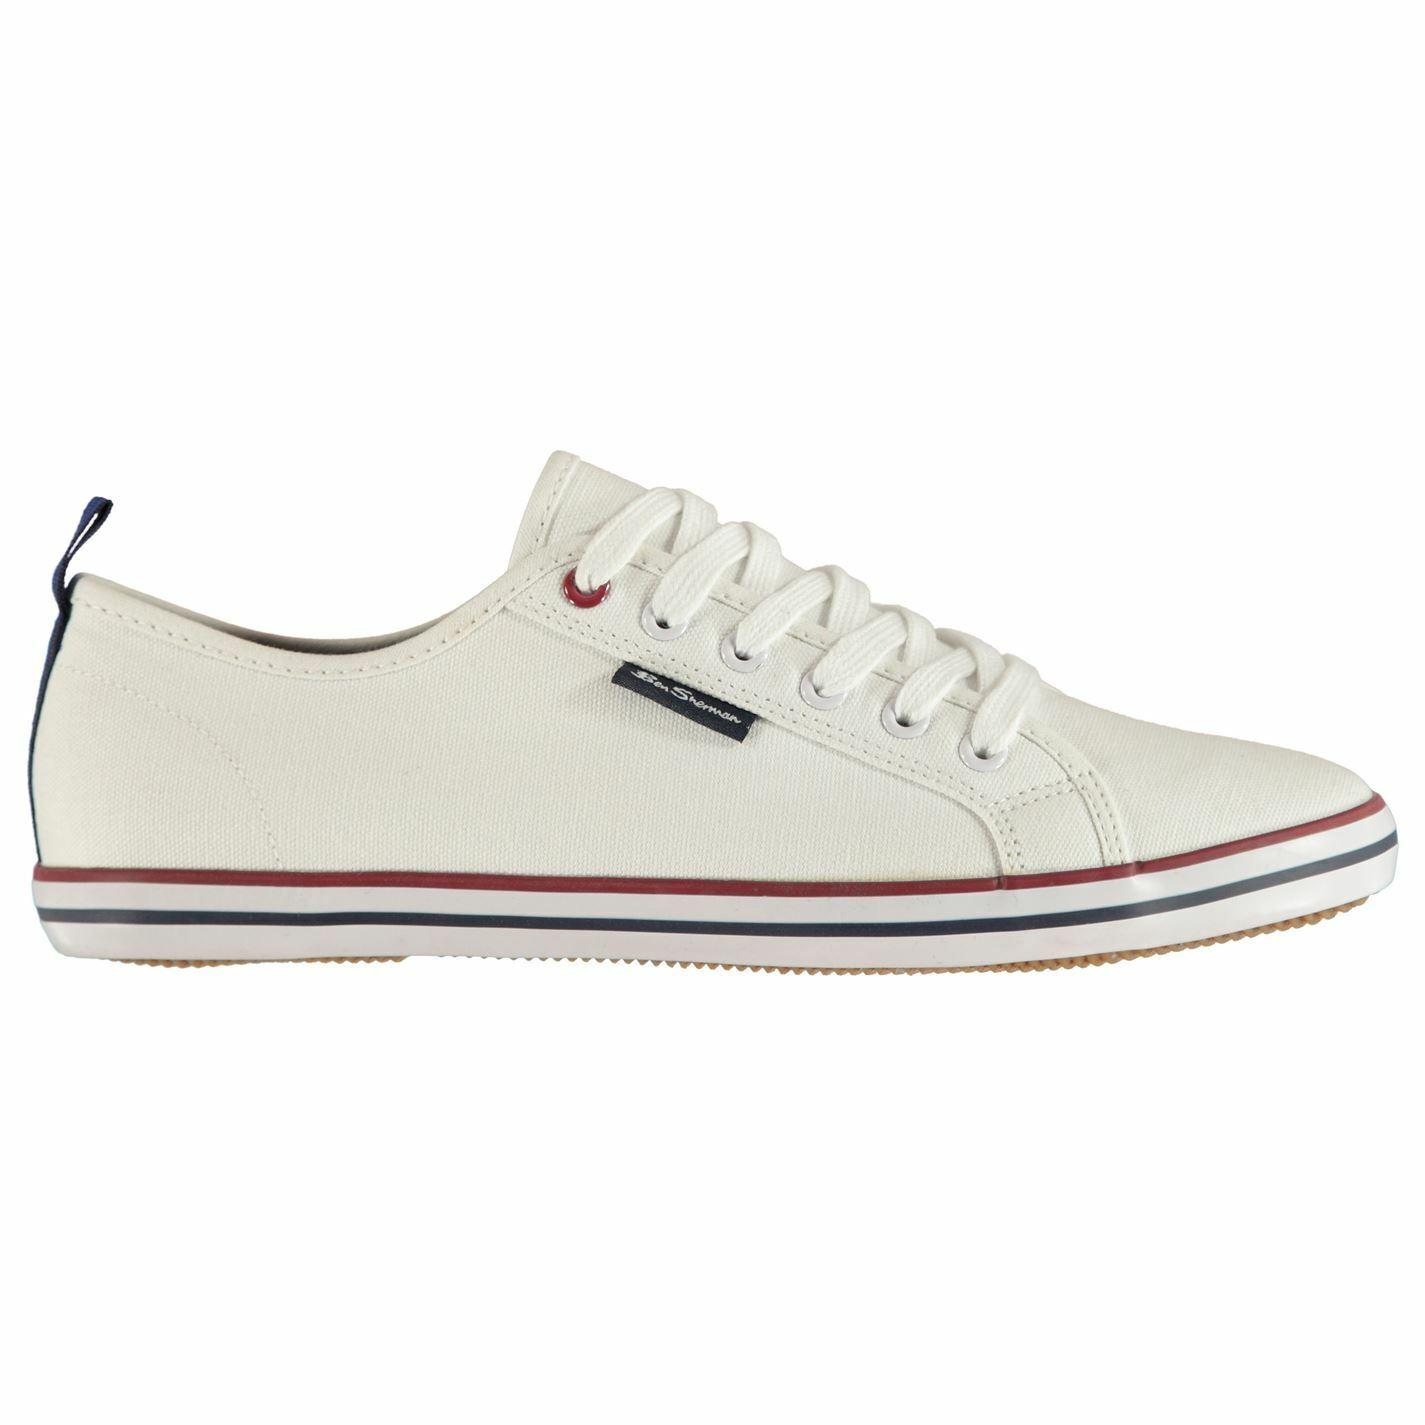 Mens Ben Sherman Lestar Canvas shoes Low Textured New